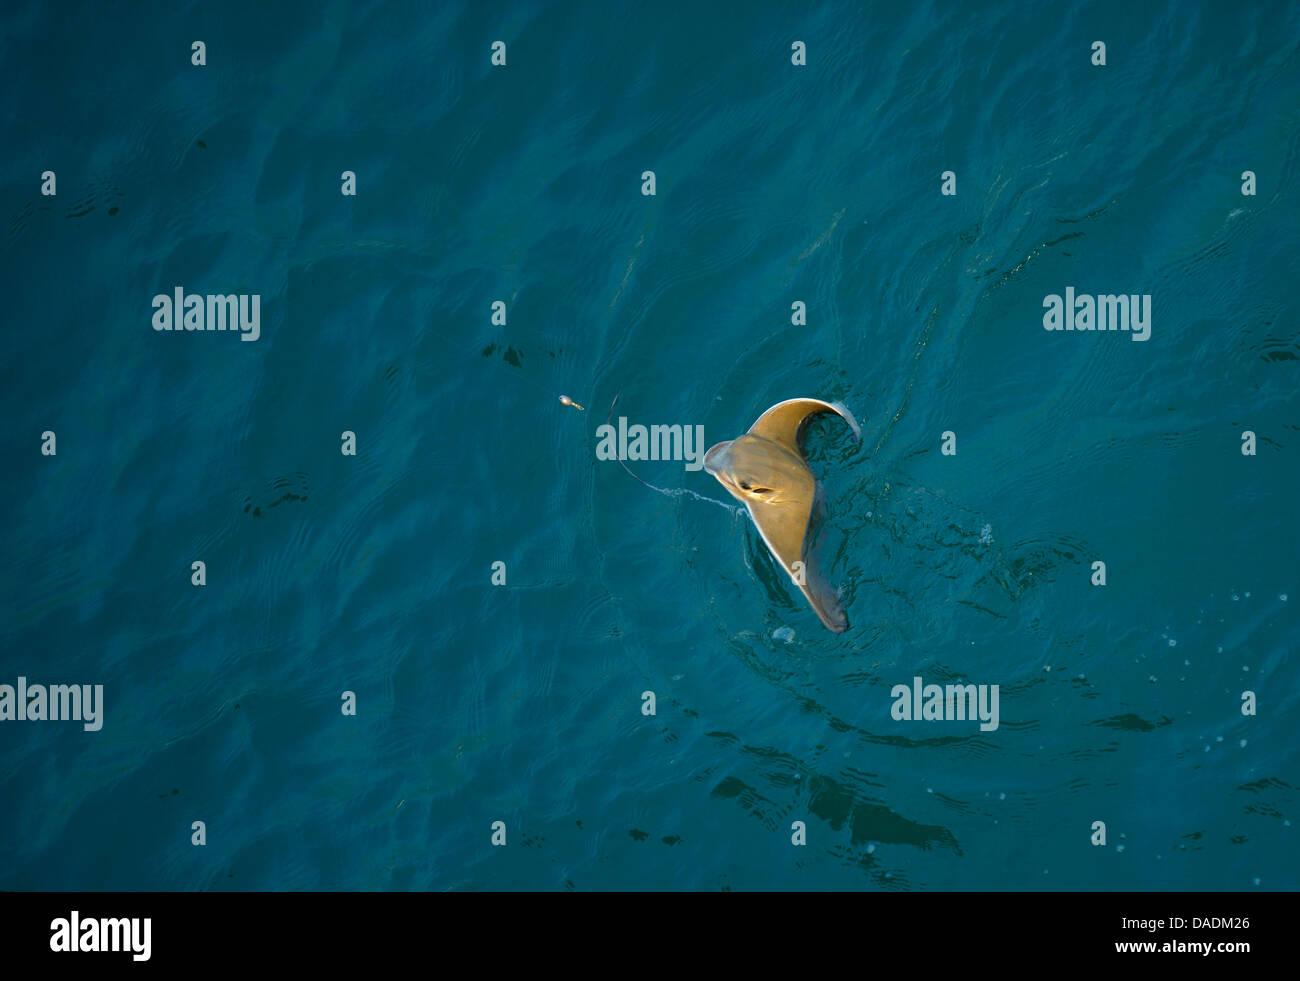 stingrays (butterfly rays) (Dasyatidae), fished stingray on water surface, USA, California, Huntington Beach - Stock Image